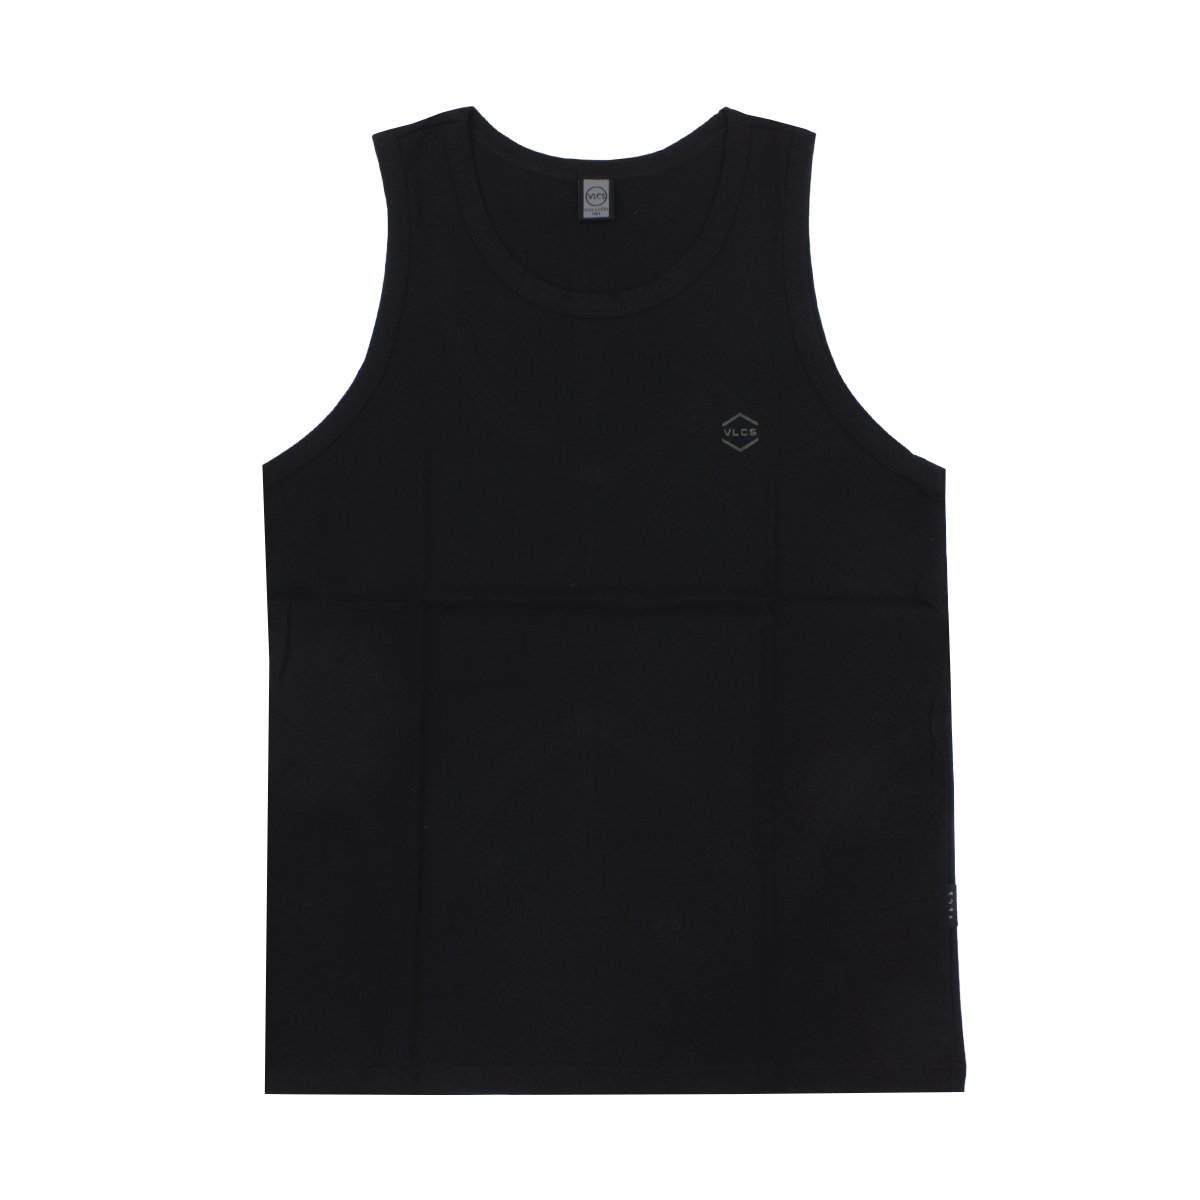 Regata Vlcs Mp Extra Masculina - Plus Size e5c33b413a5